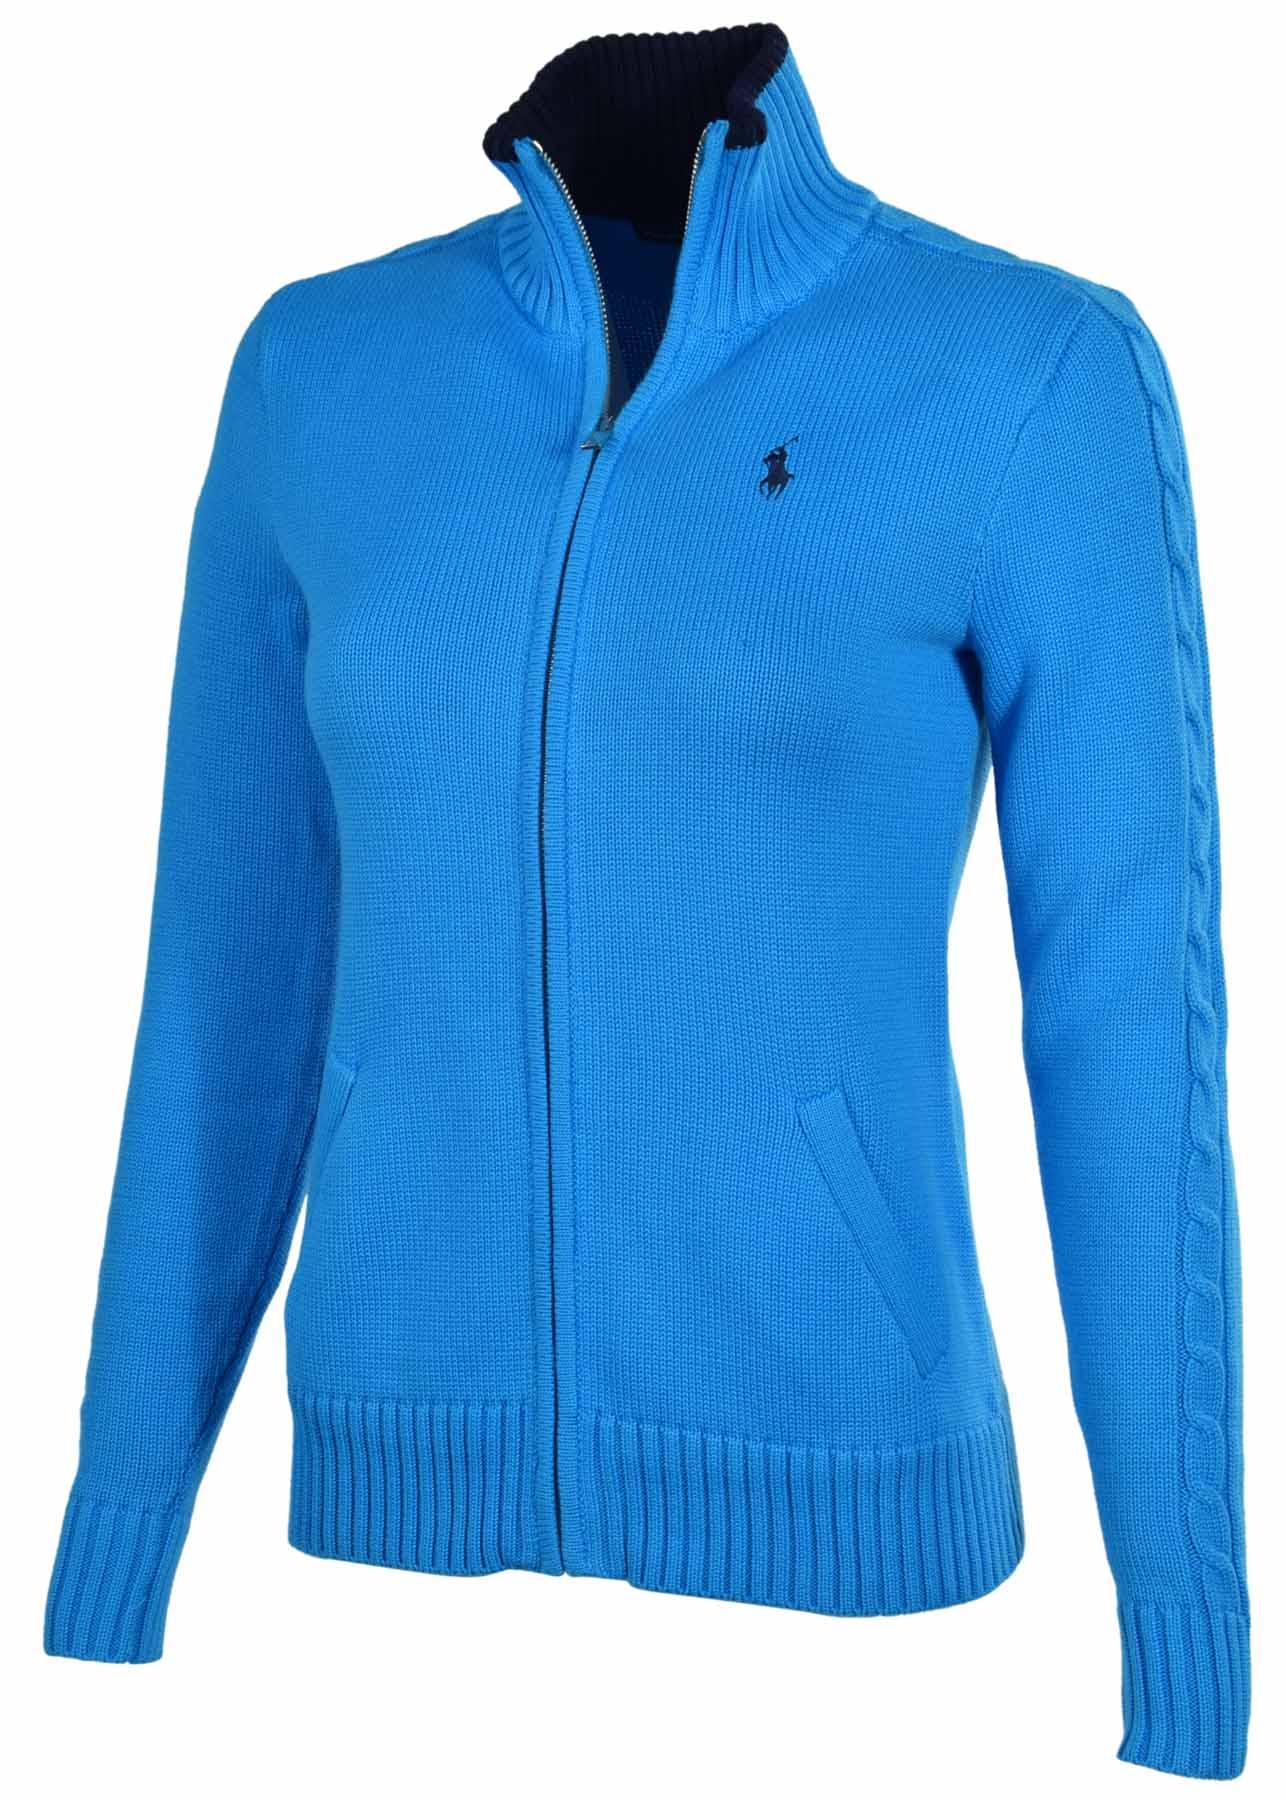 polo ralph lauren women 39 s sport full zip pony mock sweater. Black Bedroom Furniture Sets. Home Design Ideas